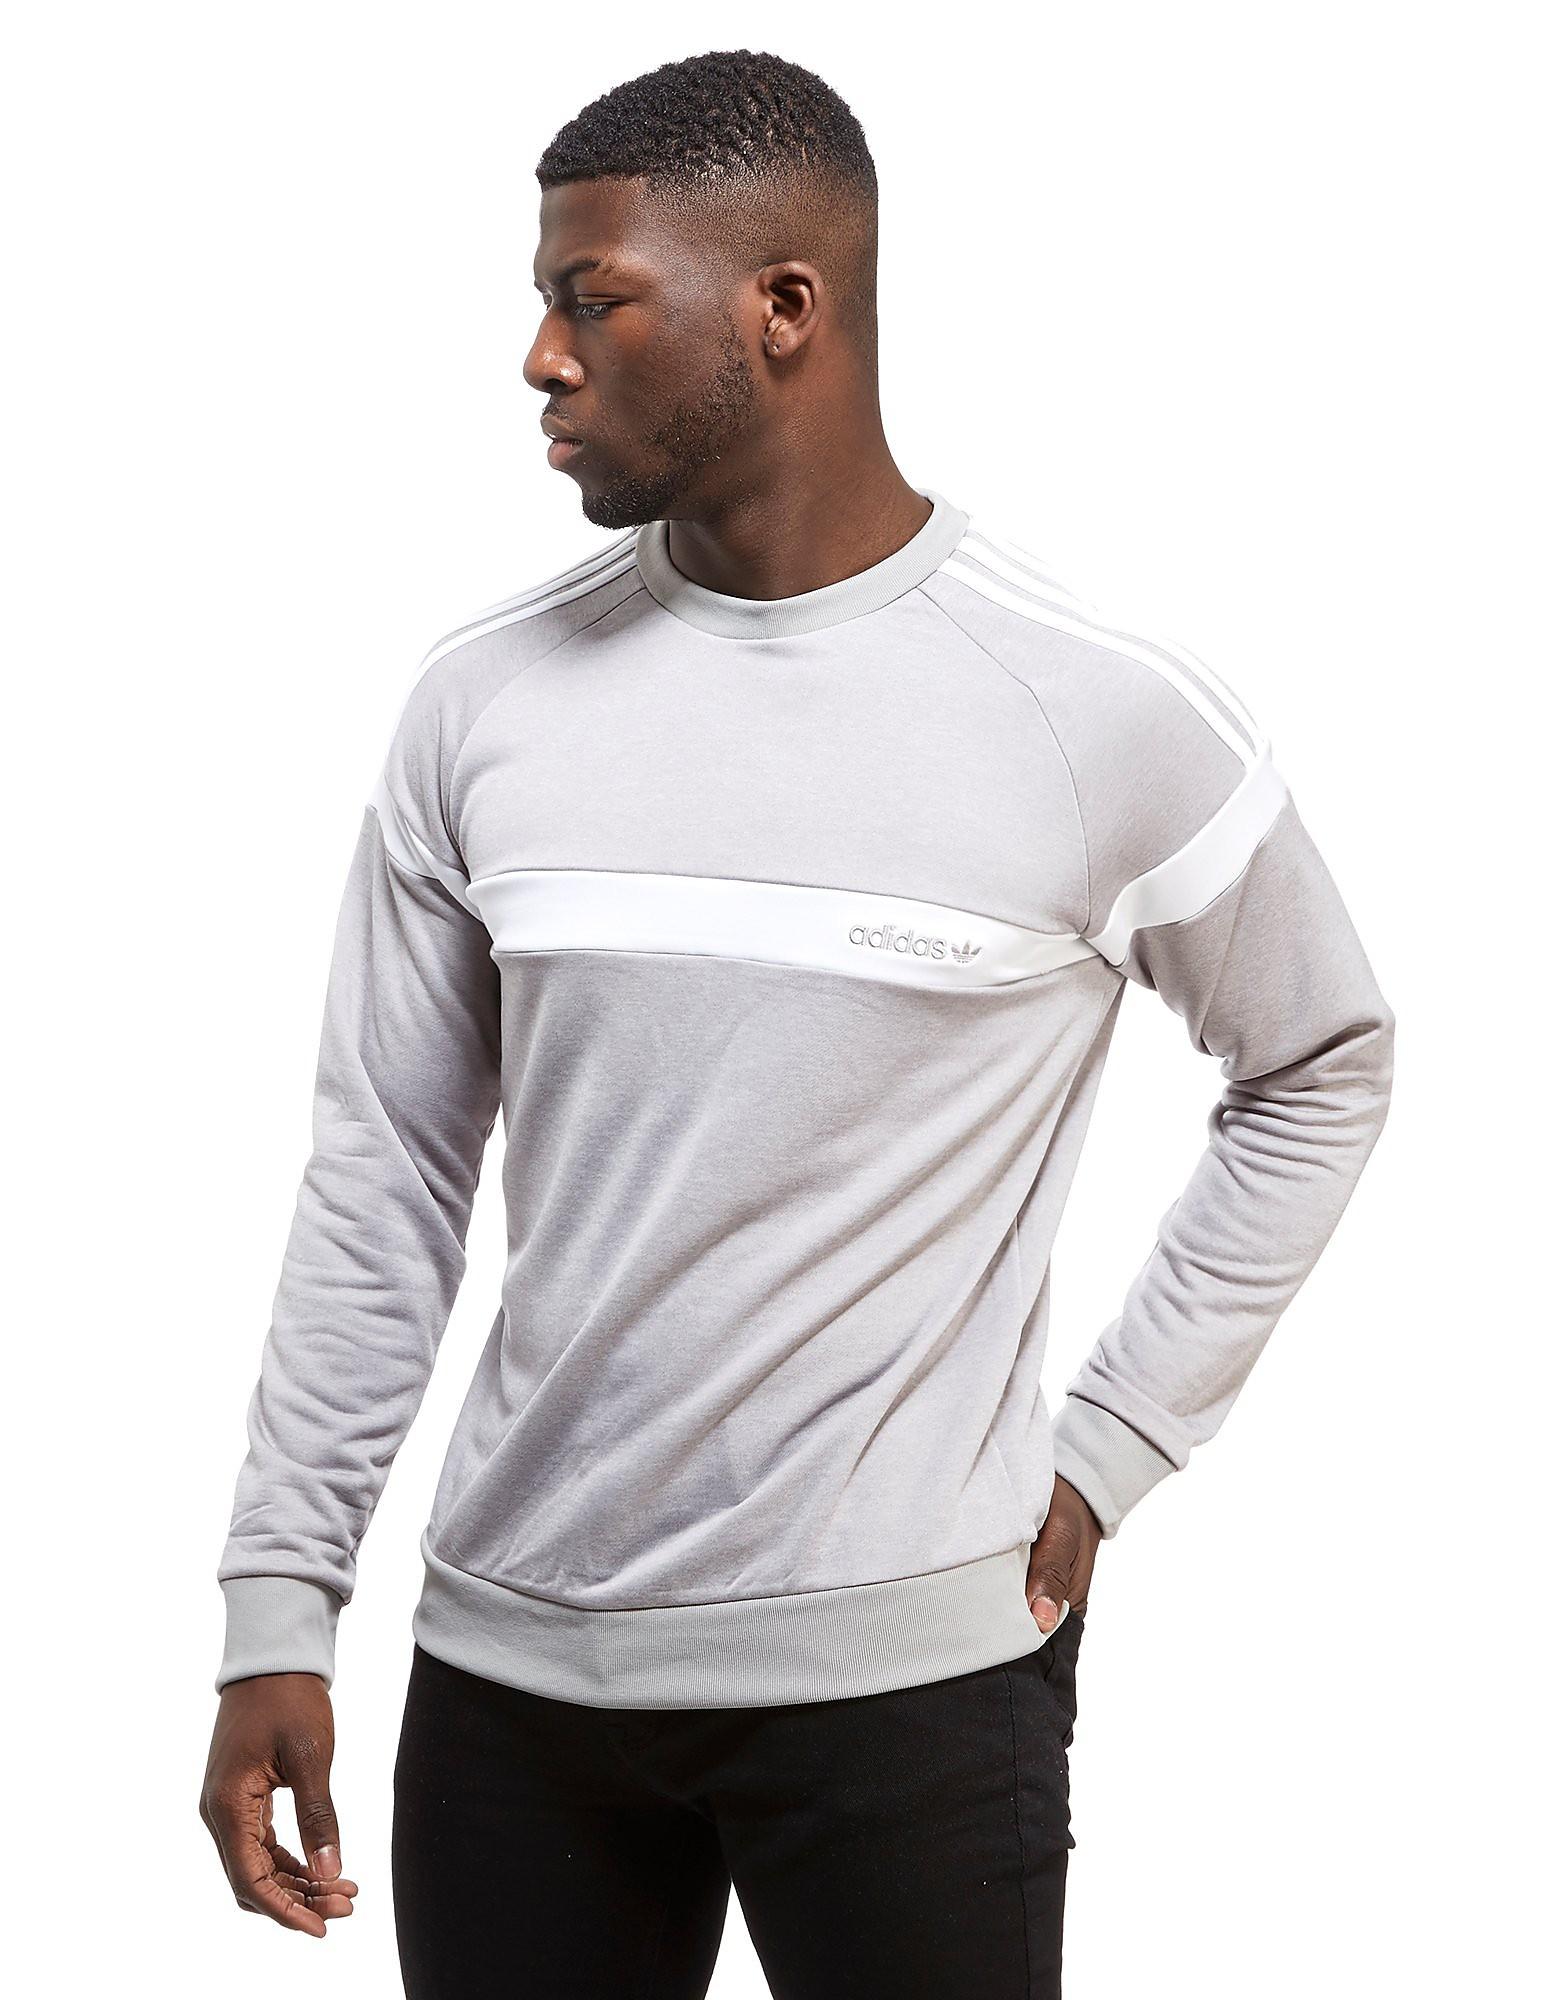 adidas Originals Superstar Crew Sweatshirt